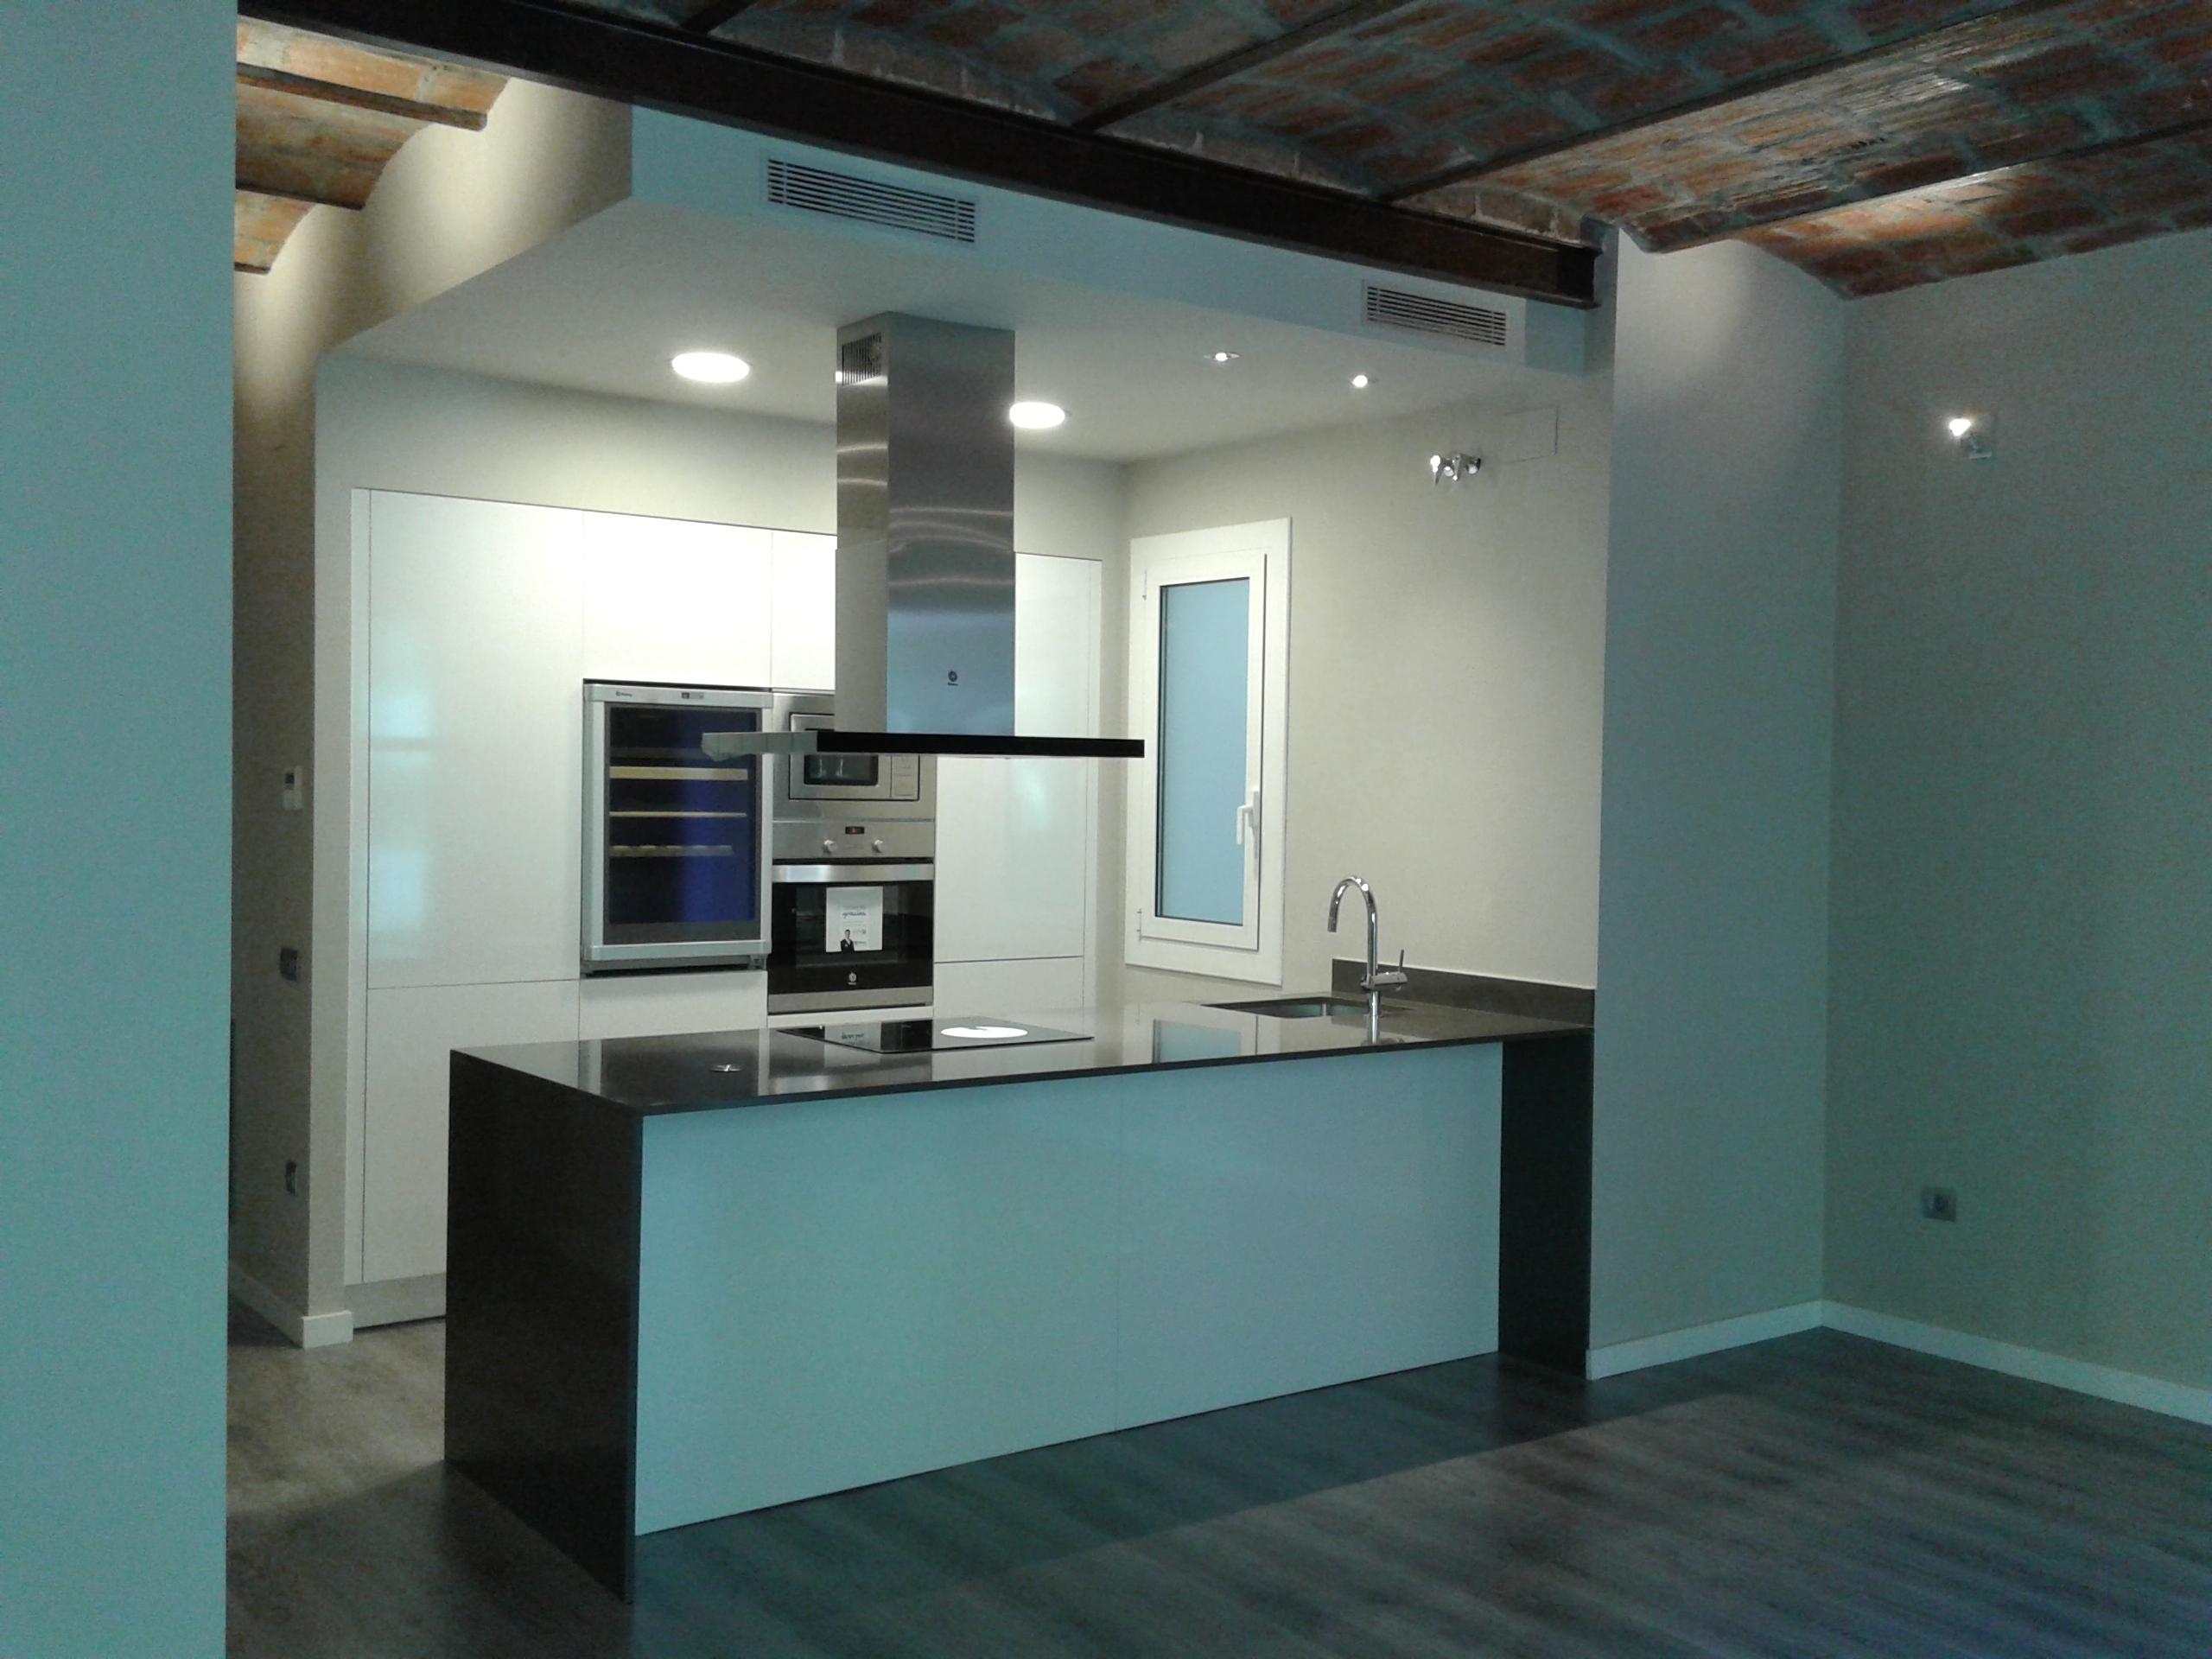 reforma-casa-cocina-silestone-marengo-07.jpg